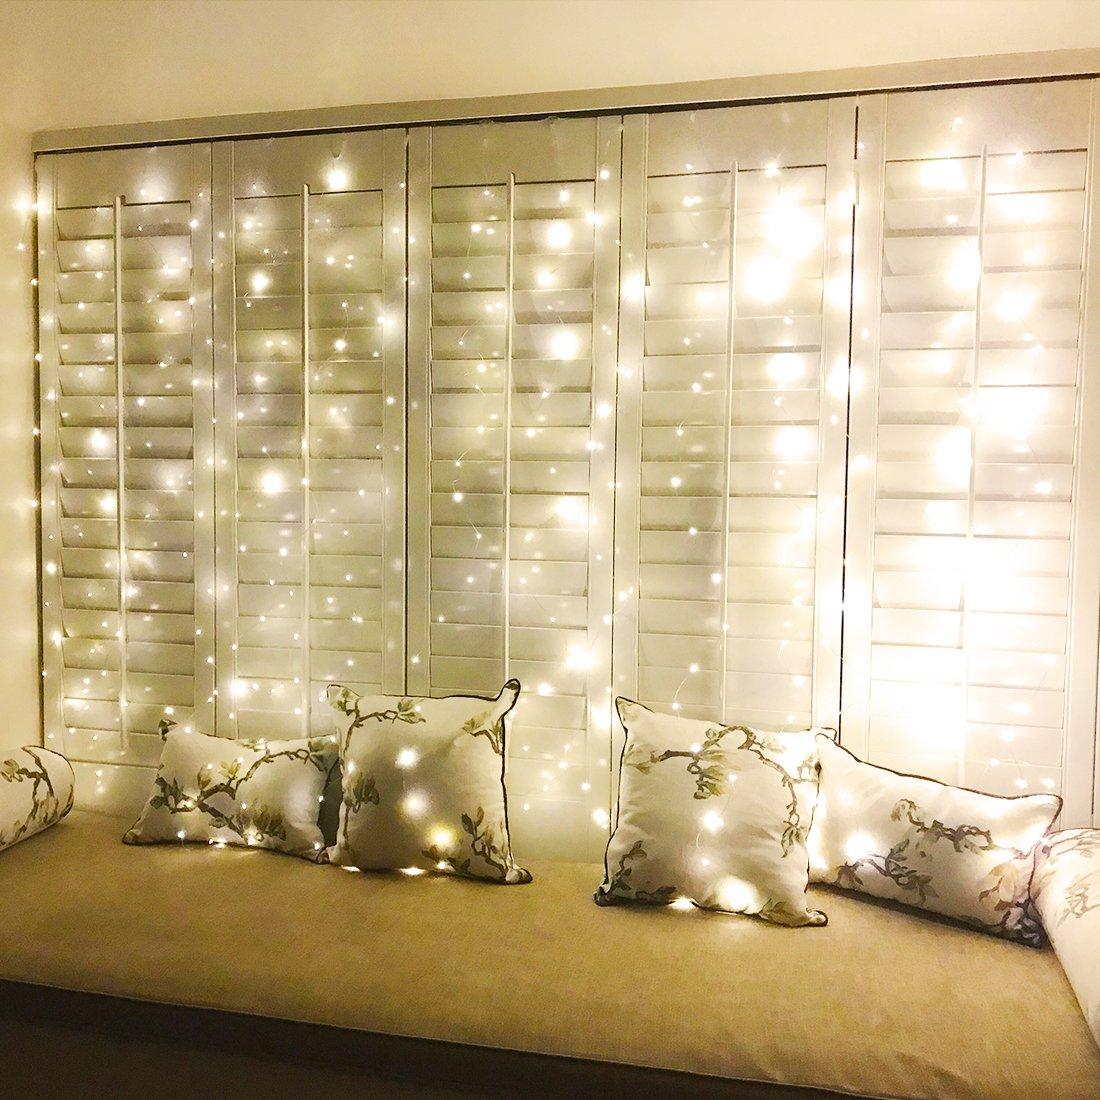 amazon com zscoo 300 led window curtain fairy string light silver rh amazon com